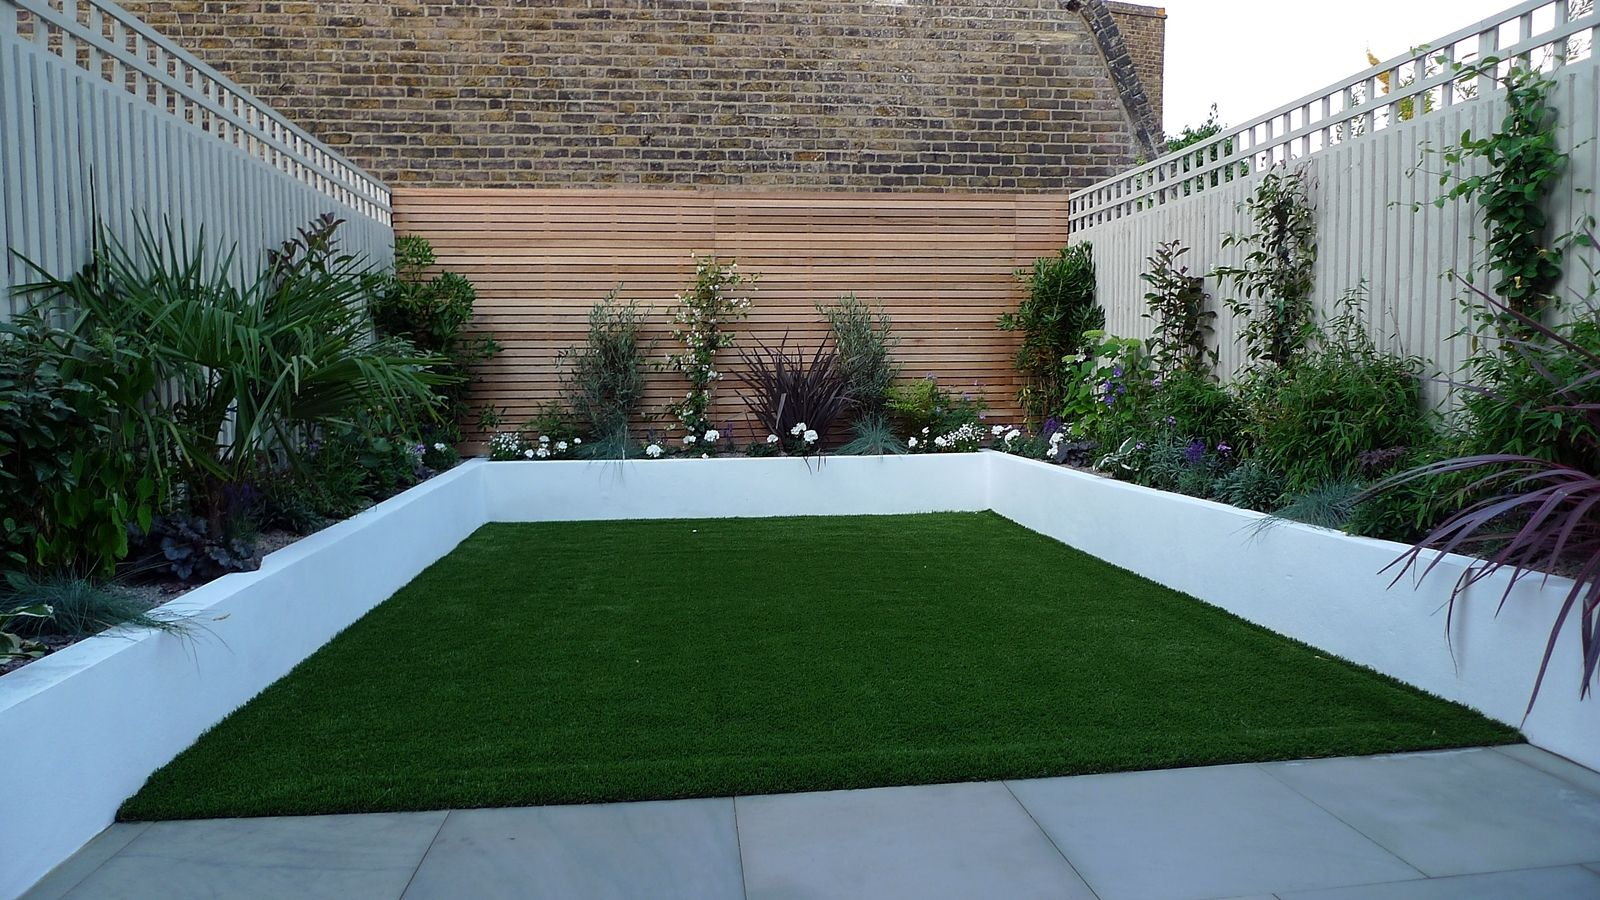 astonishing garden design ideas. Astonishing Garden View For Small Design Ideas With White